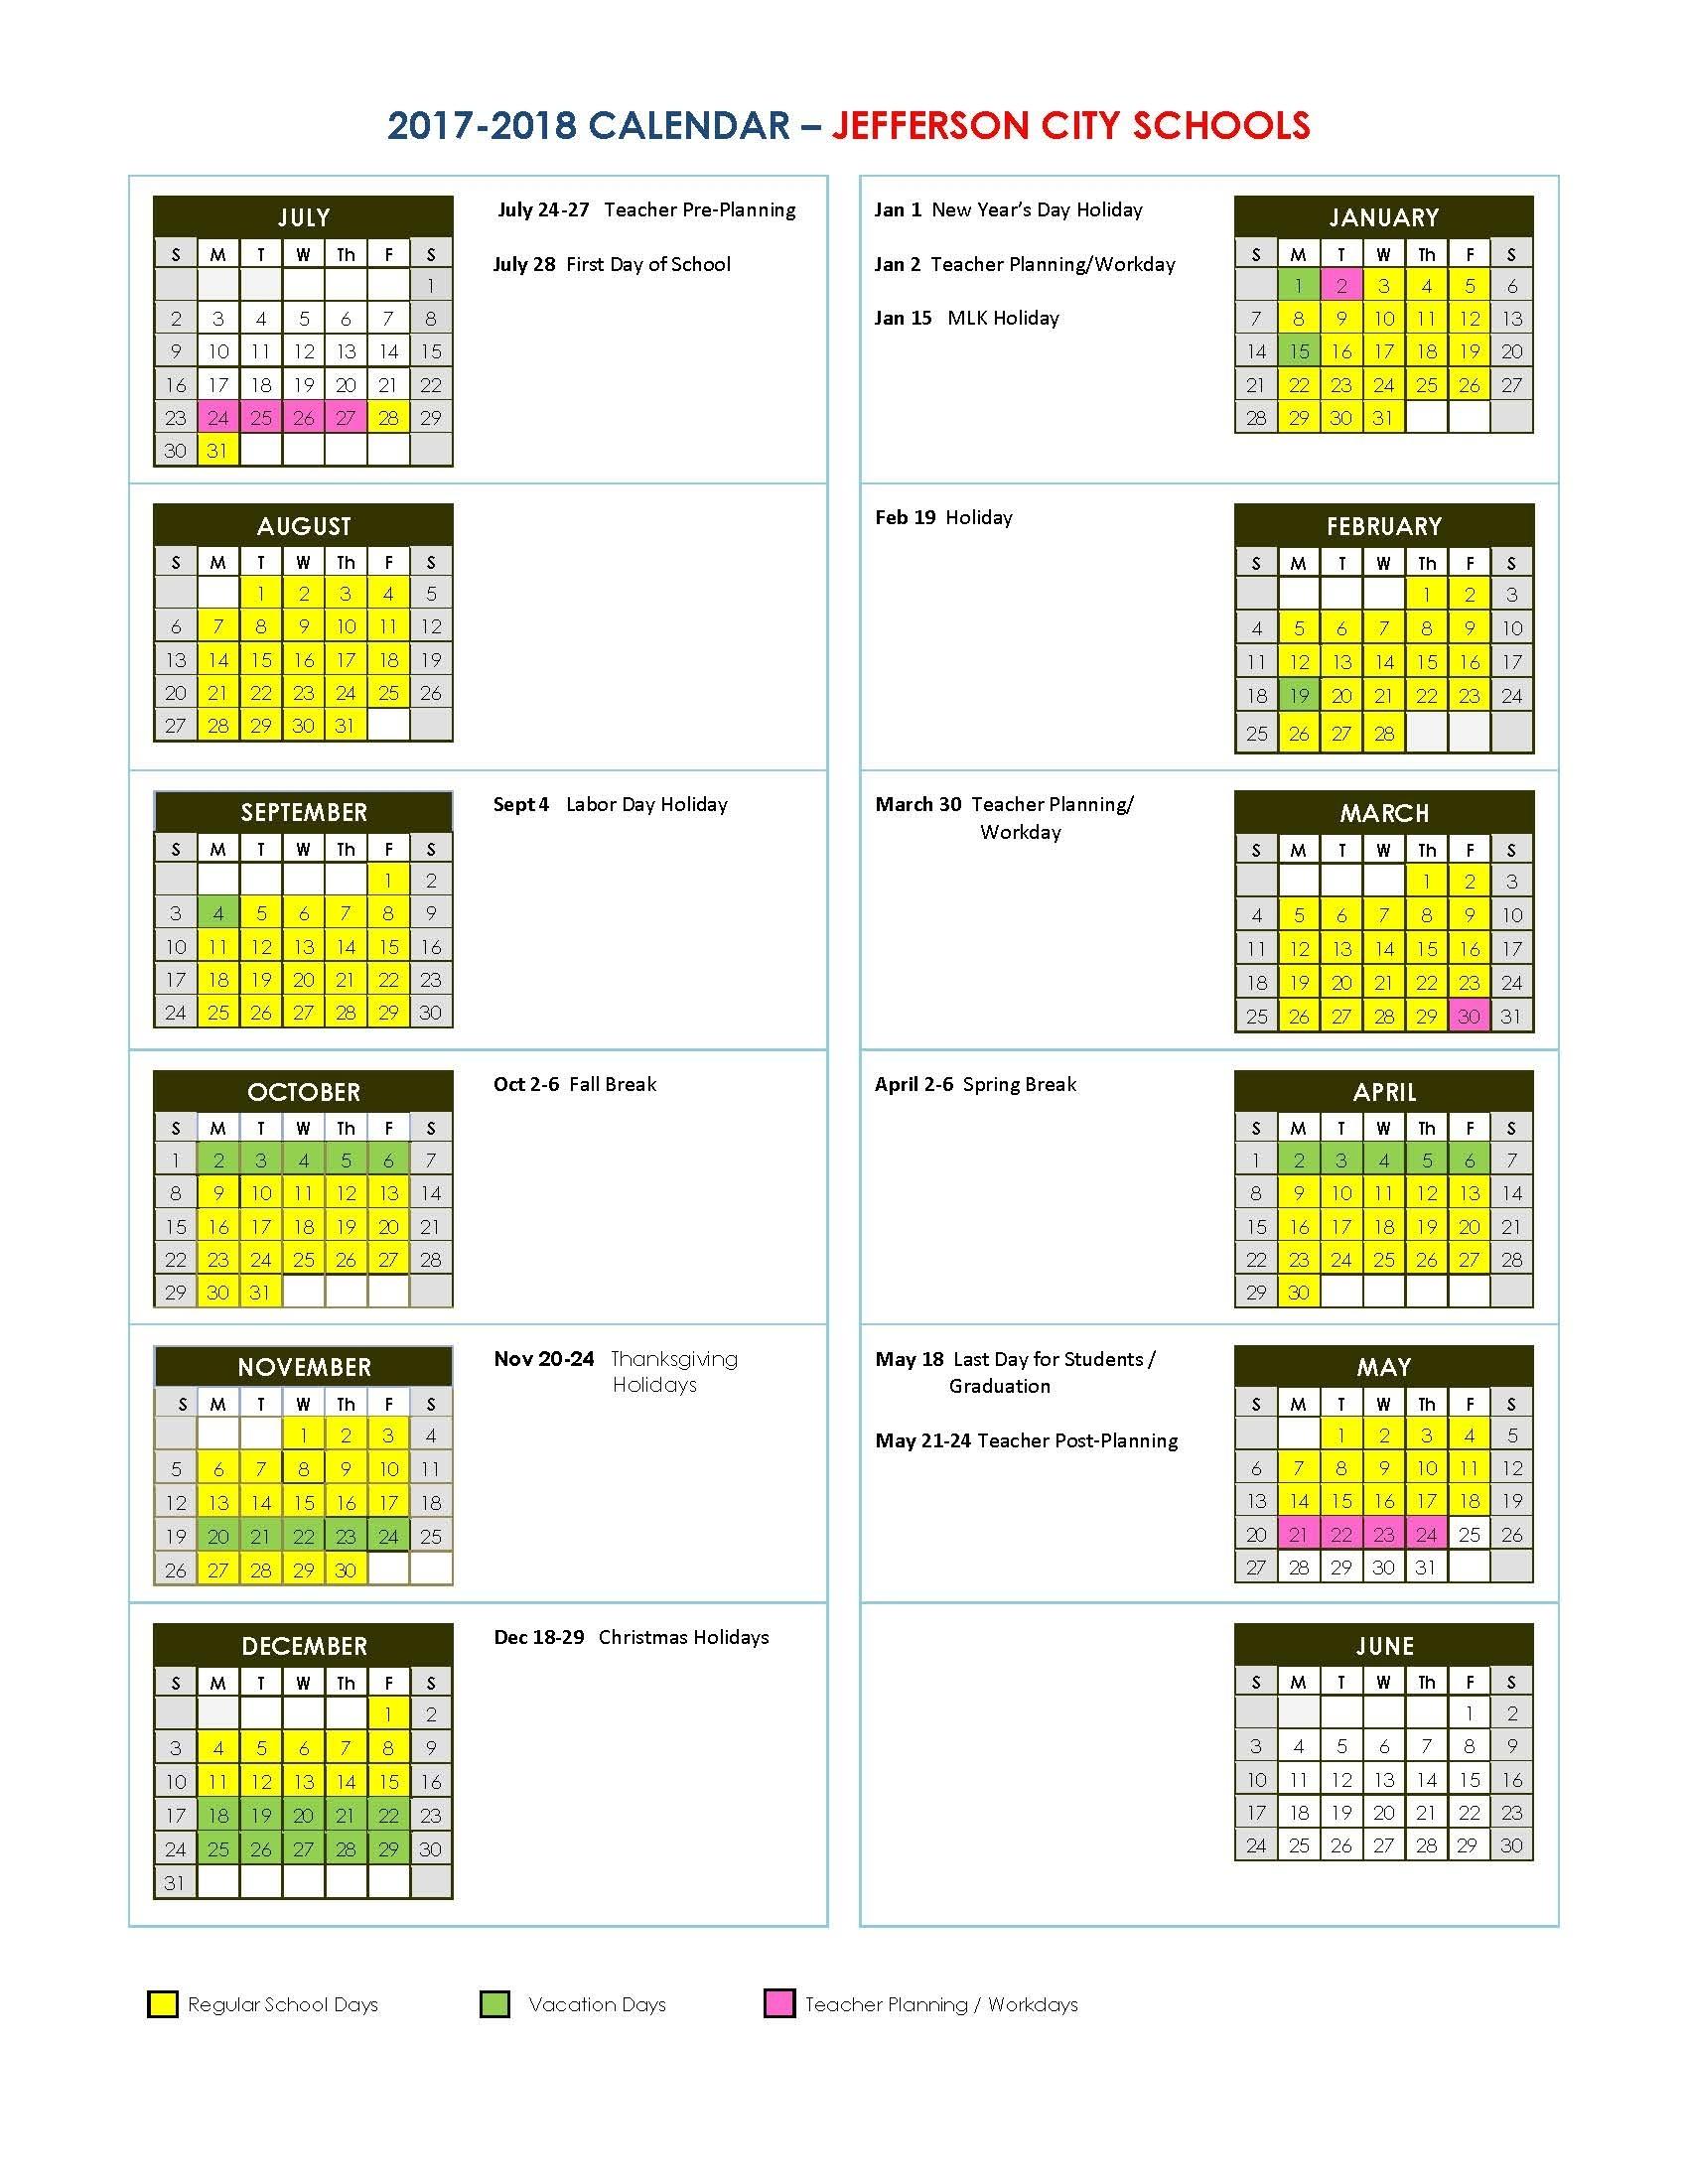 Jefferson City Schools pertaining to Uga Official Calendar 2019-2020